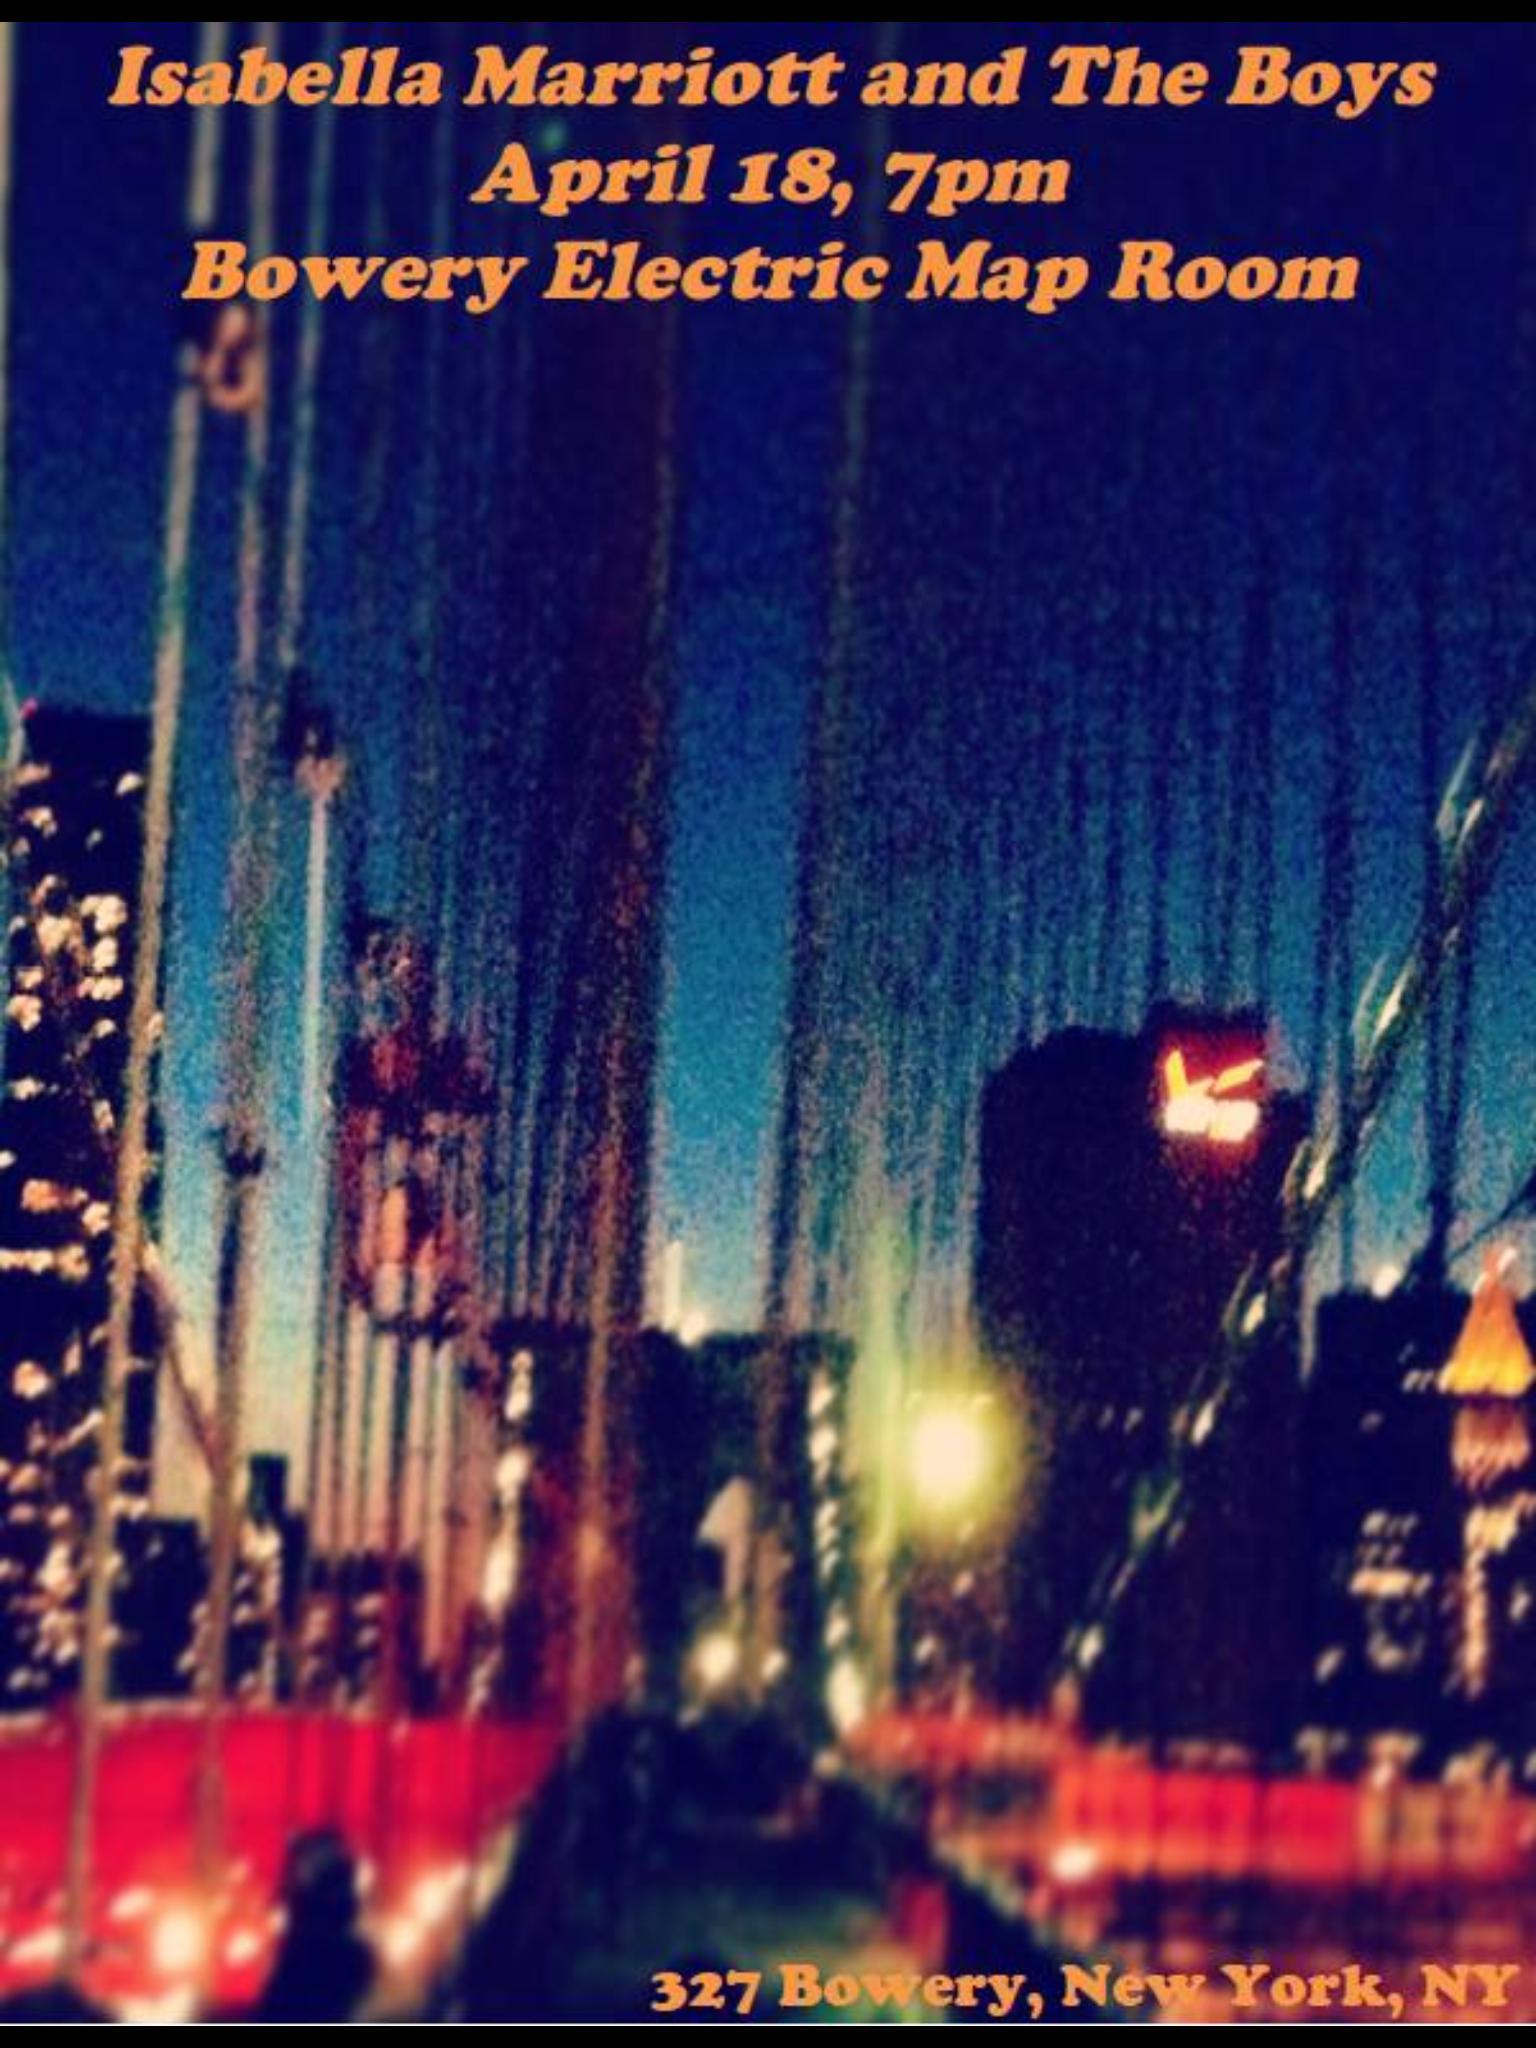 Bowery Electric April 18.jpg